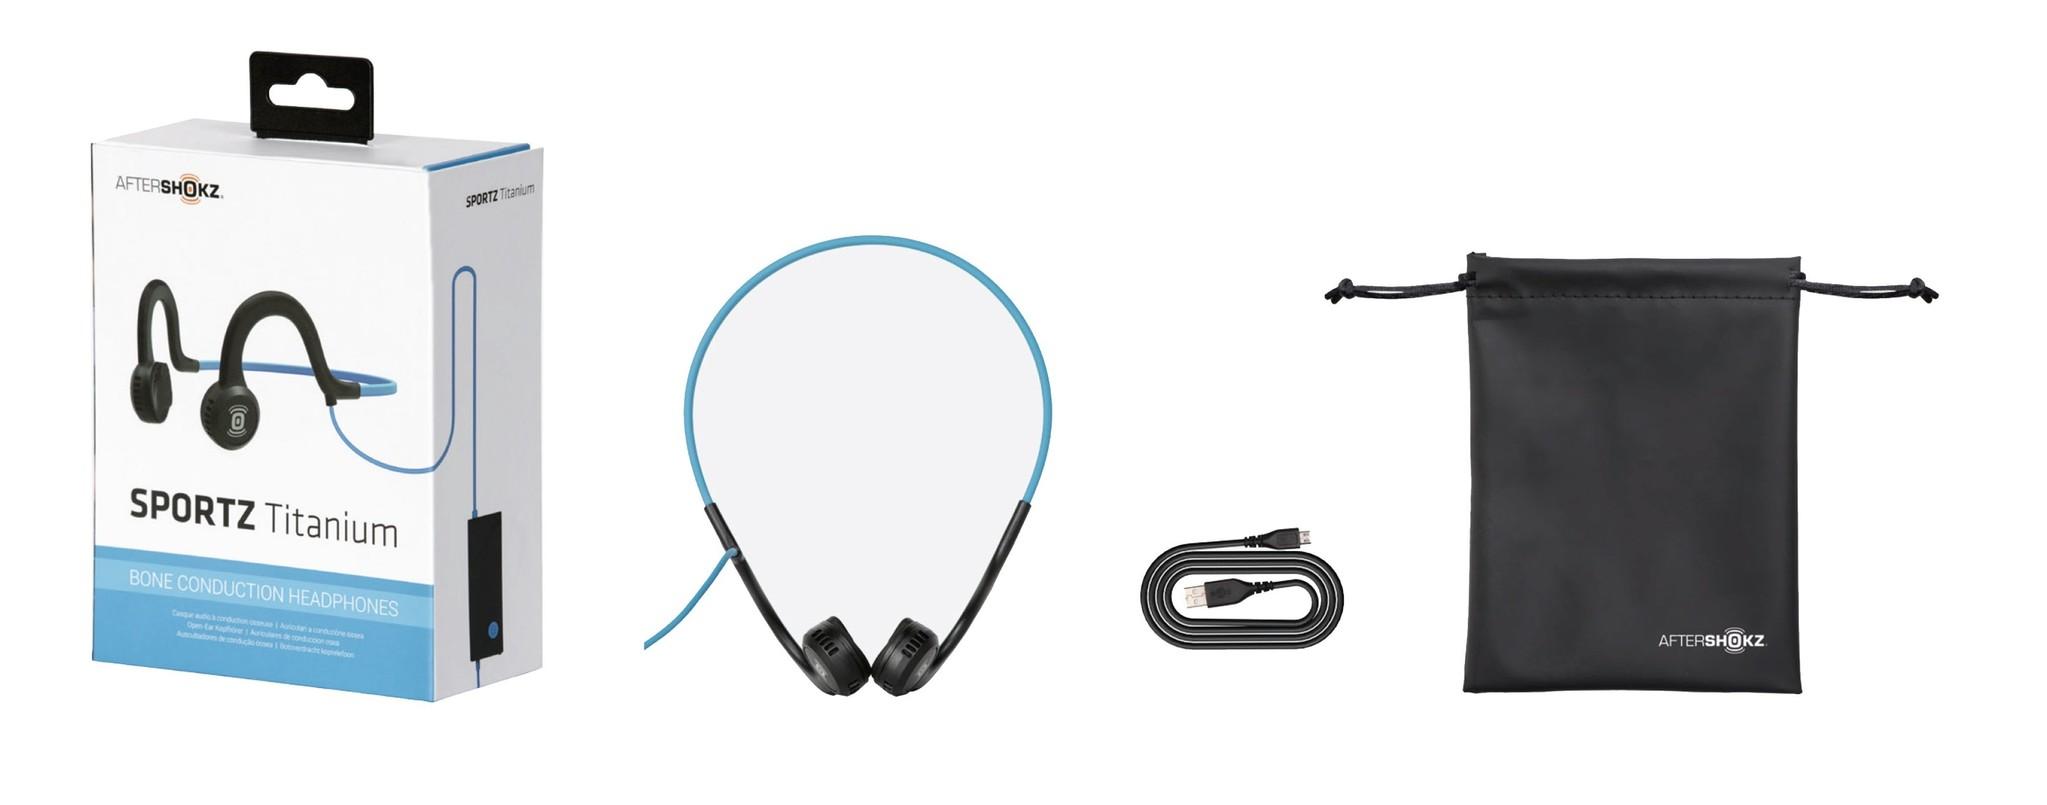 AfterShokz Sportz Titanium Onyx Black Wired Headphones